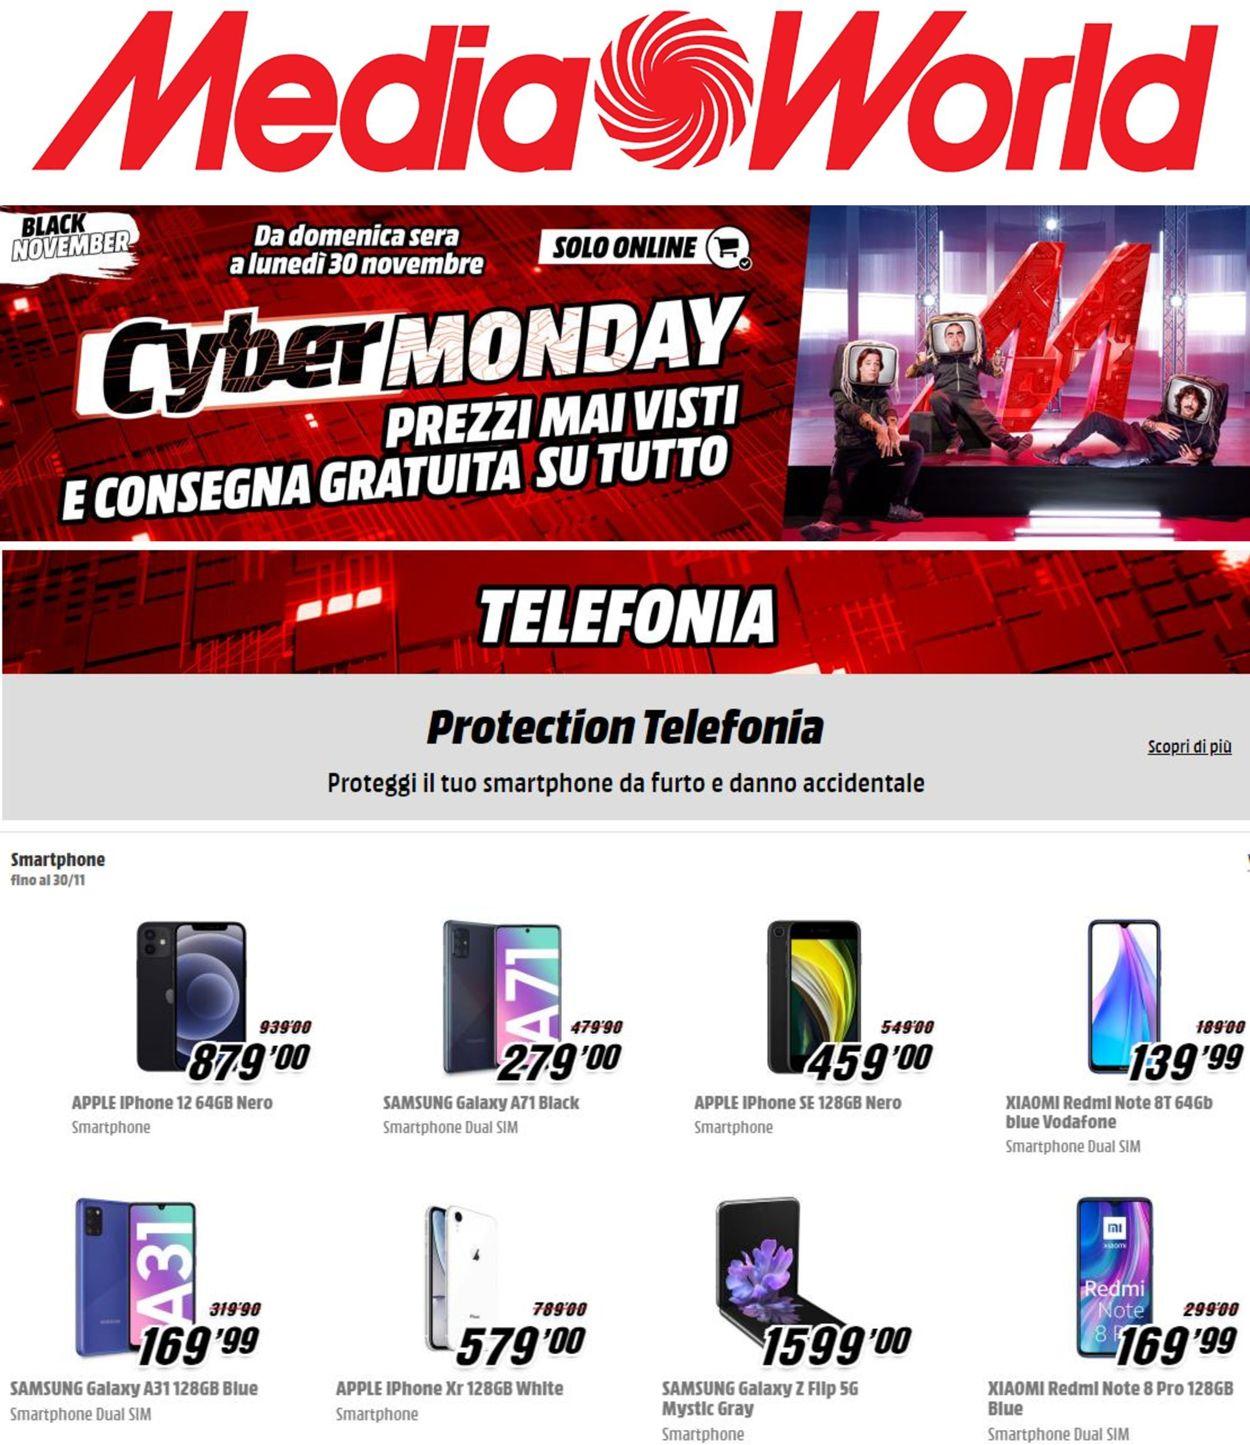 Volantino Media World Cyber Monday 2020 - Offerte 30/11-01/12/2020